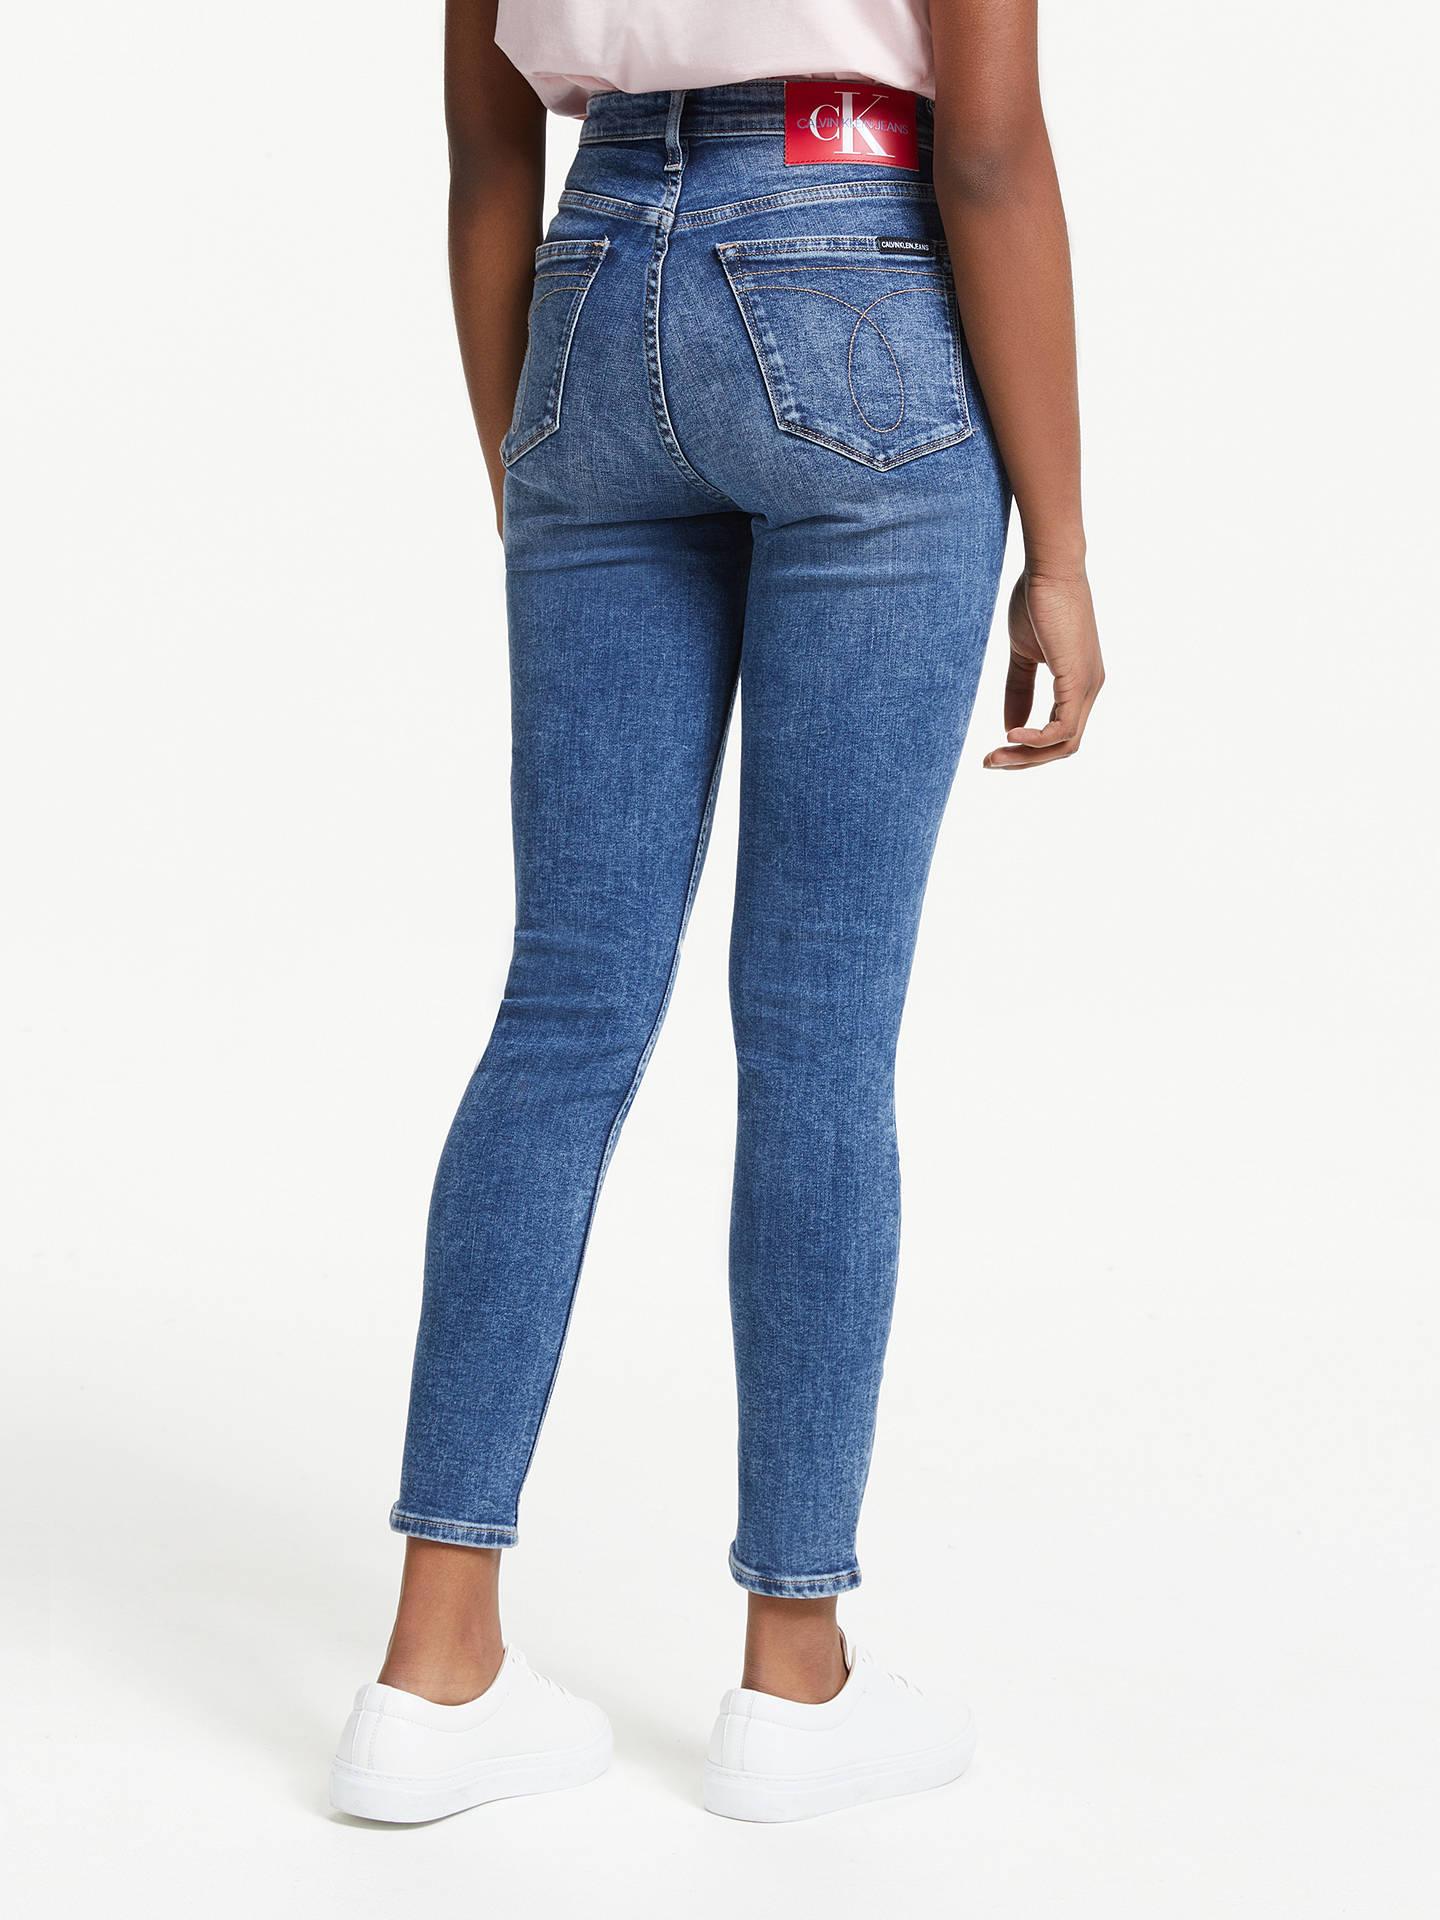 e4f0ed866bca0 ... Buy Calvin Klein High Rise Skinny Ankle Jeans, Iconic Dark Stone,  W27/L30 ...